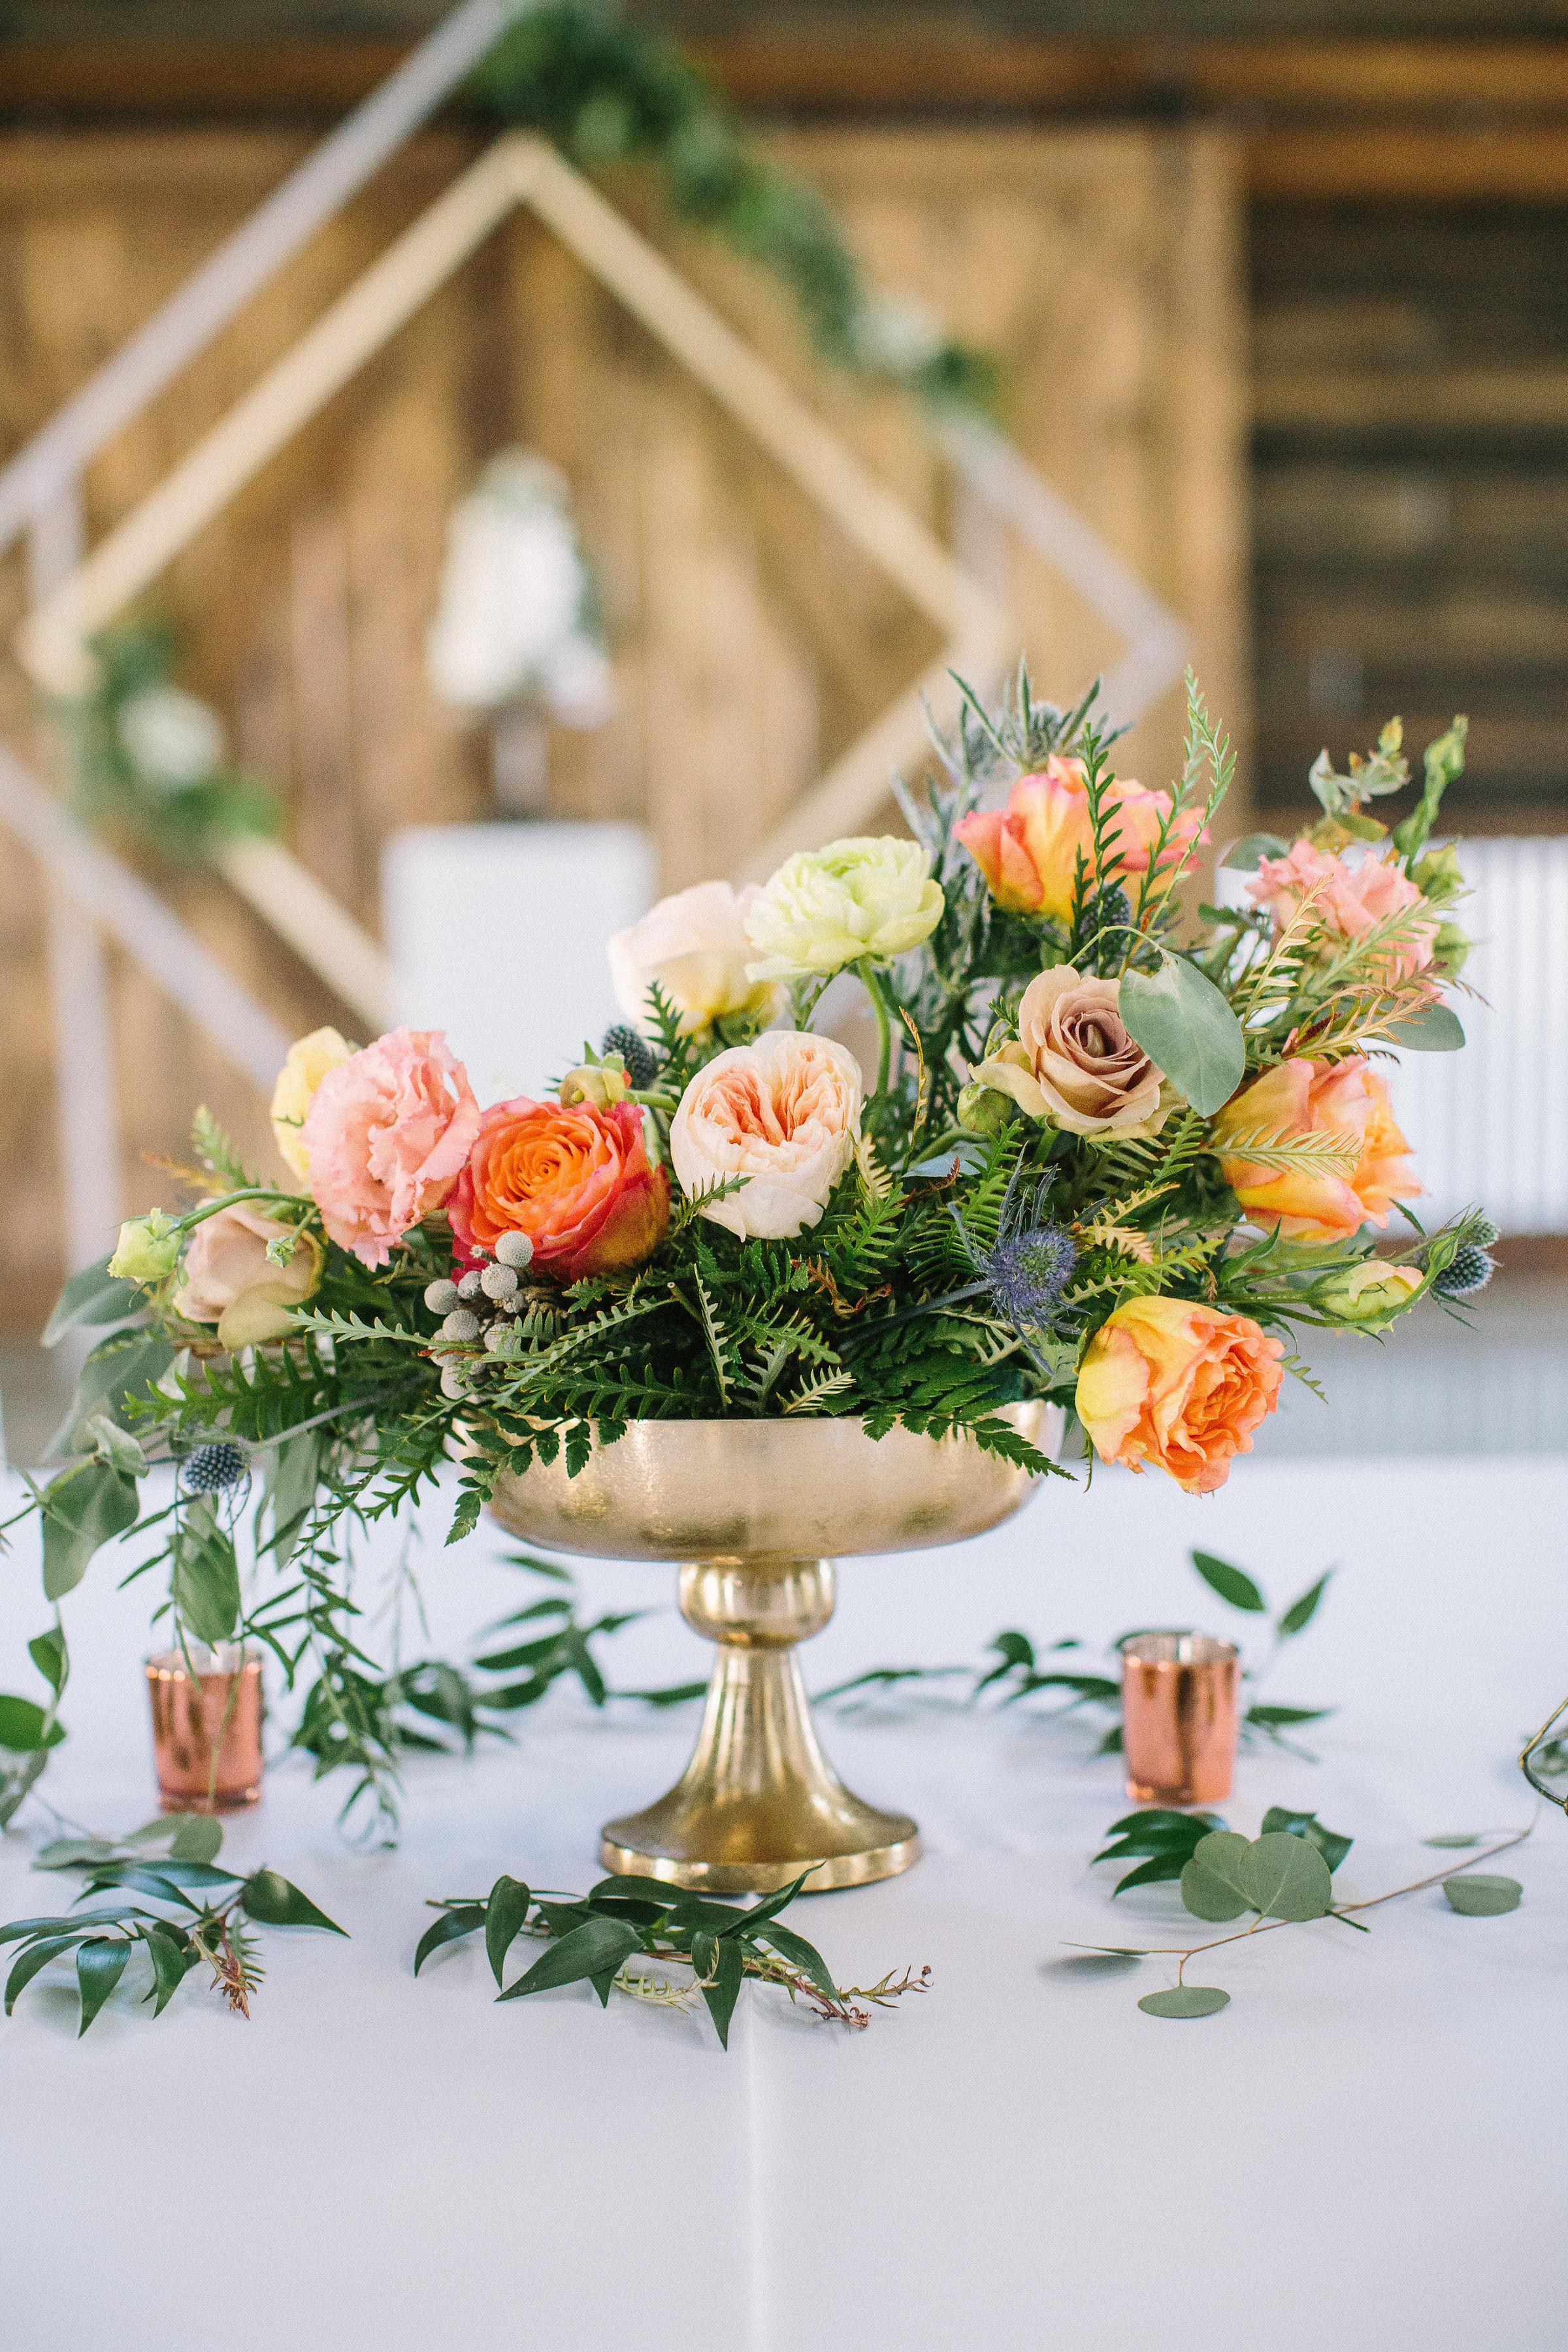 Ellen-Ashton-Photography-Peach-Creek-Ranch-Weddings-Wed-and-Prosper78.jpg